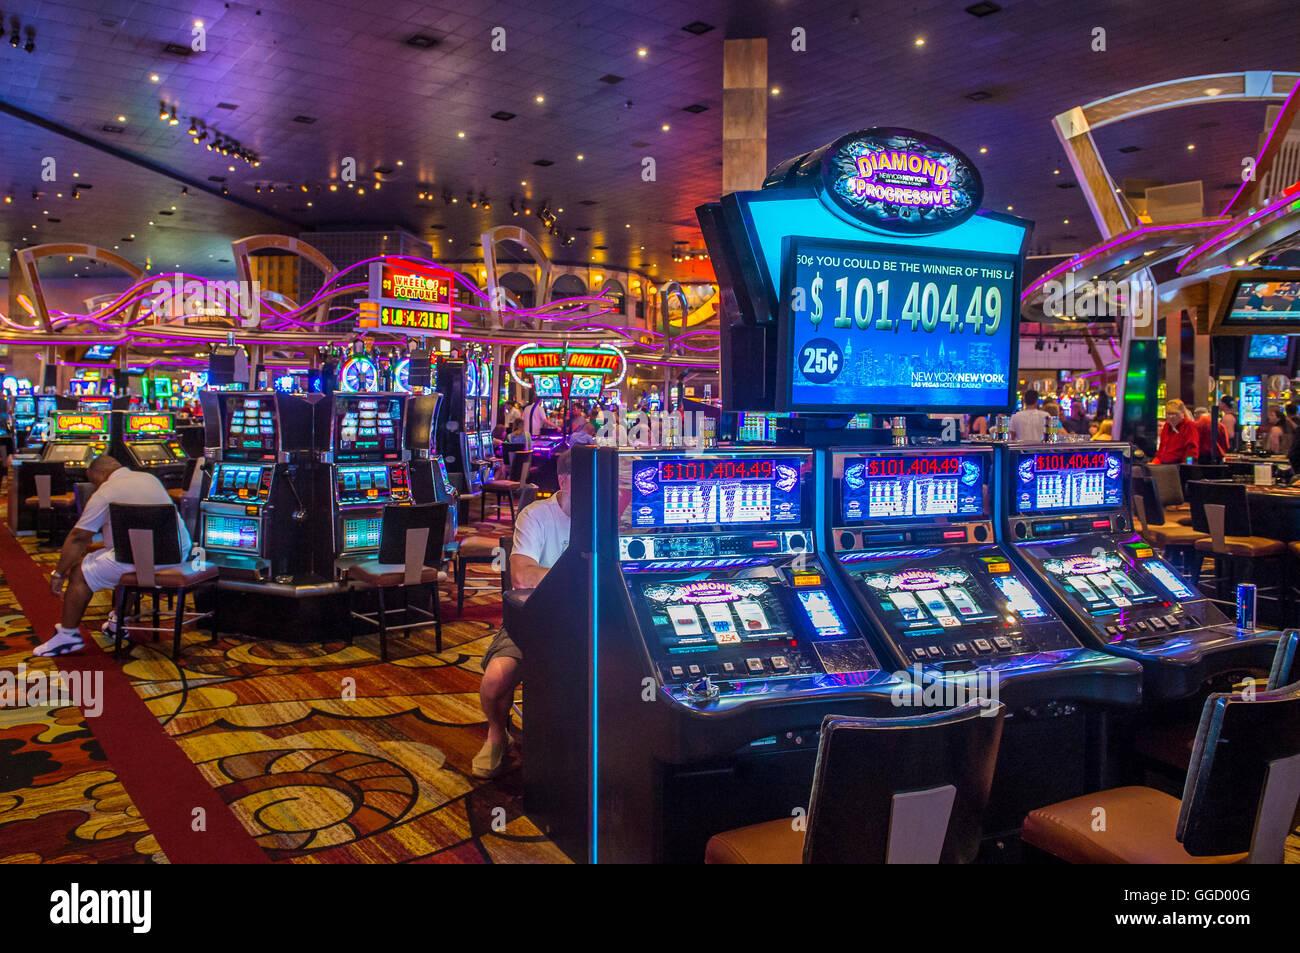 Casino new technology vegas gambling in legalizing